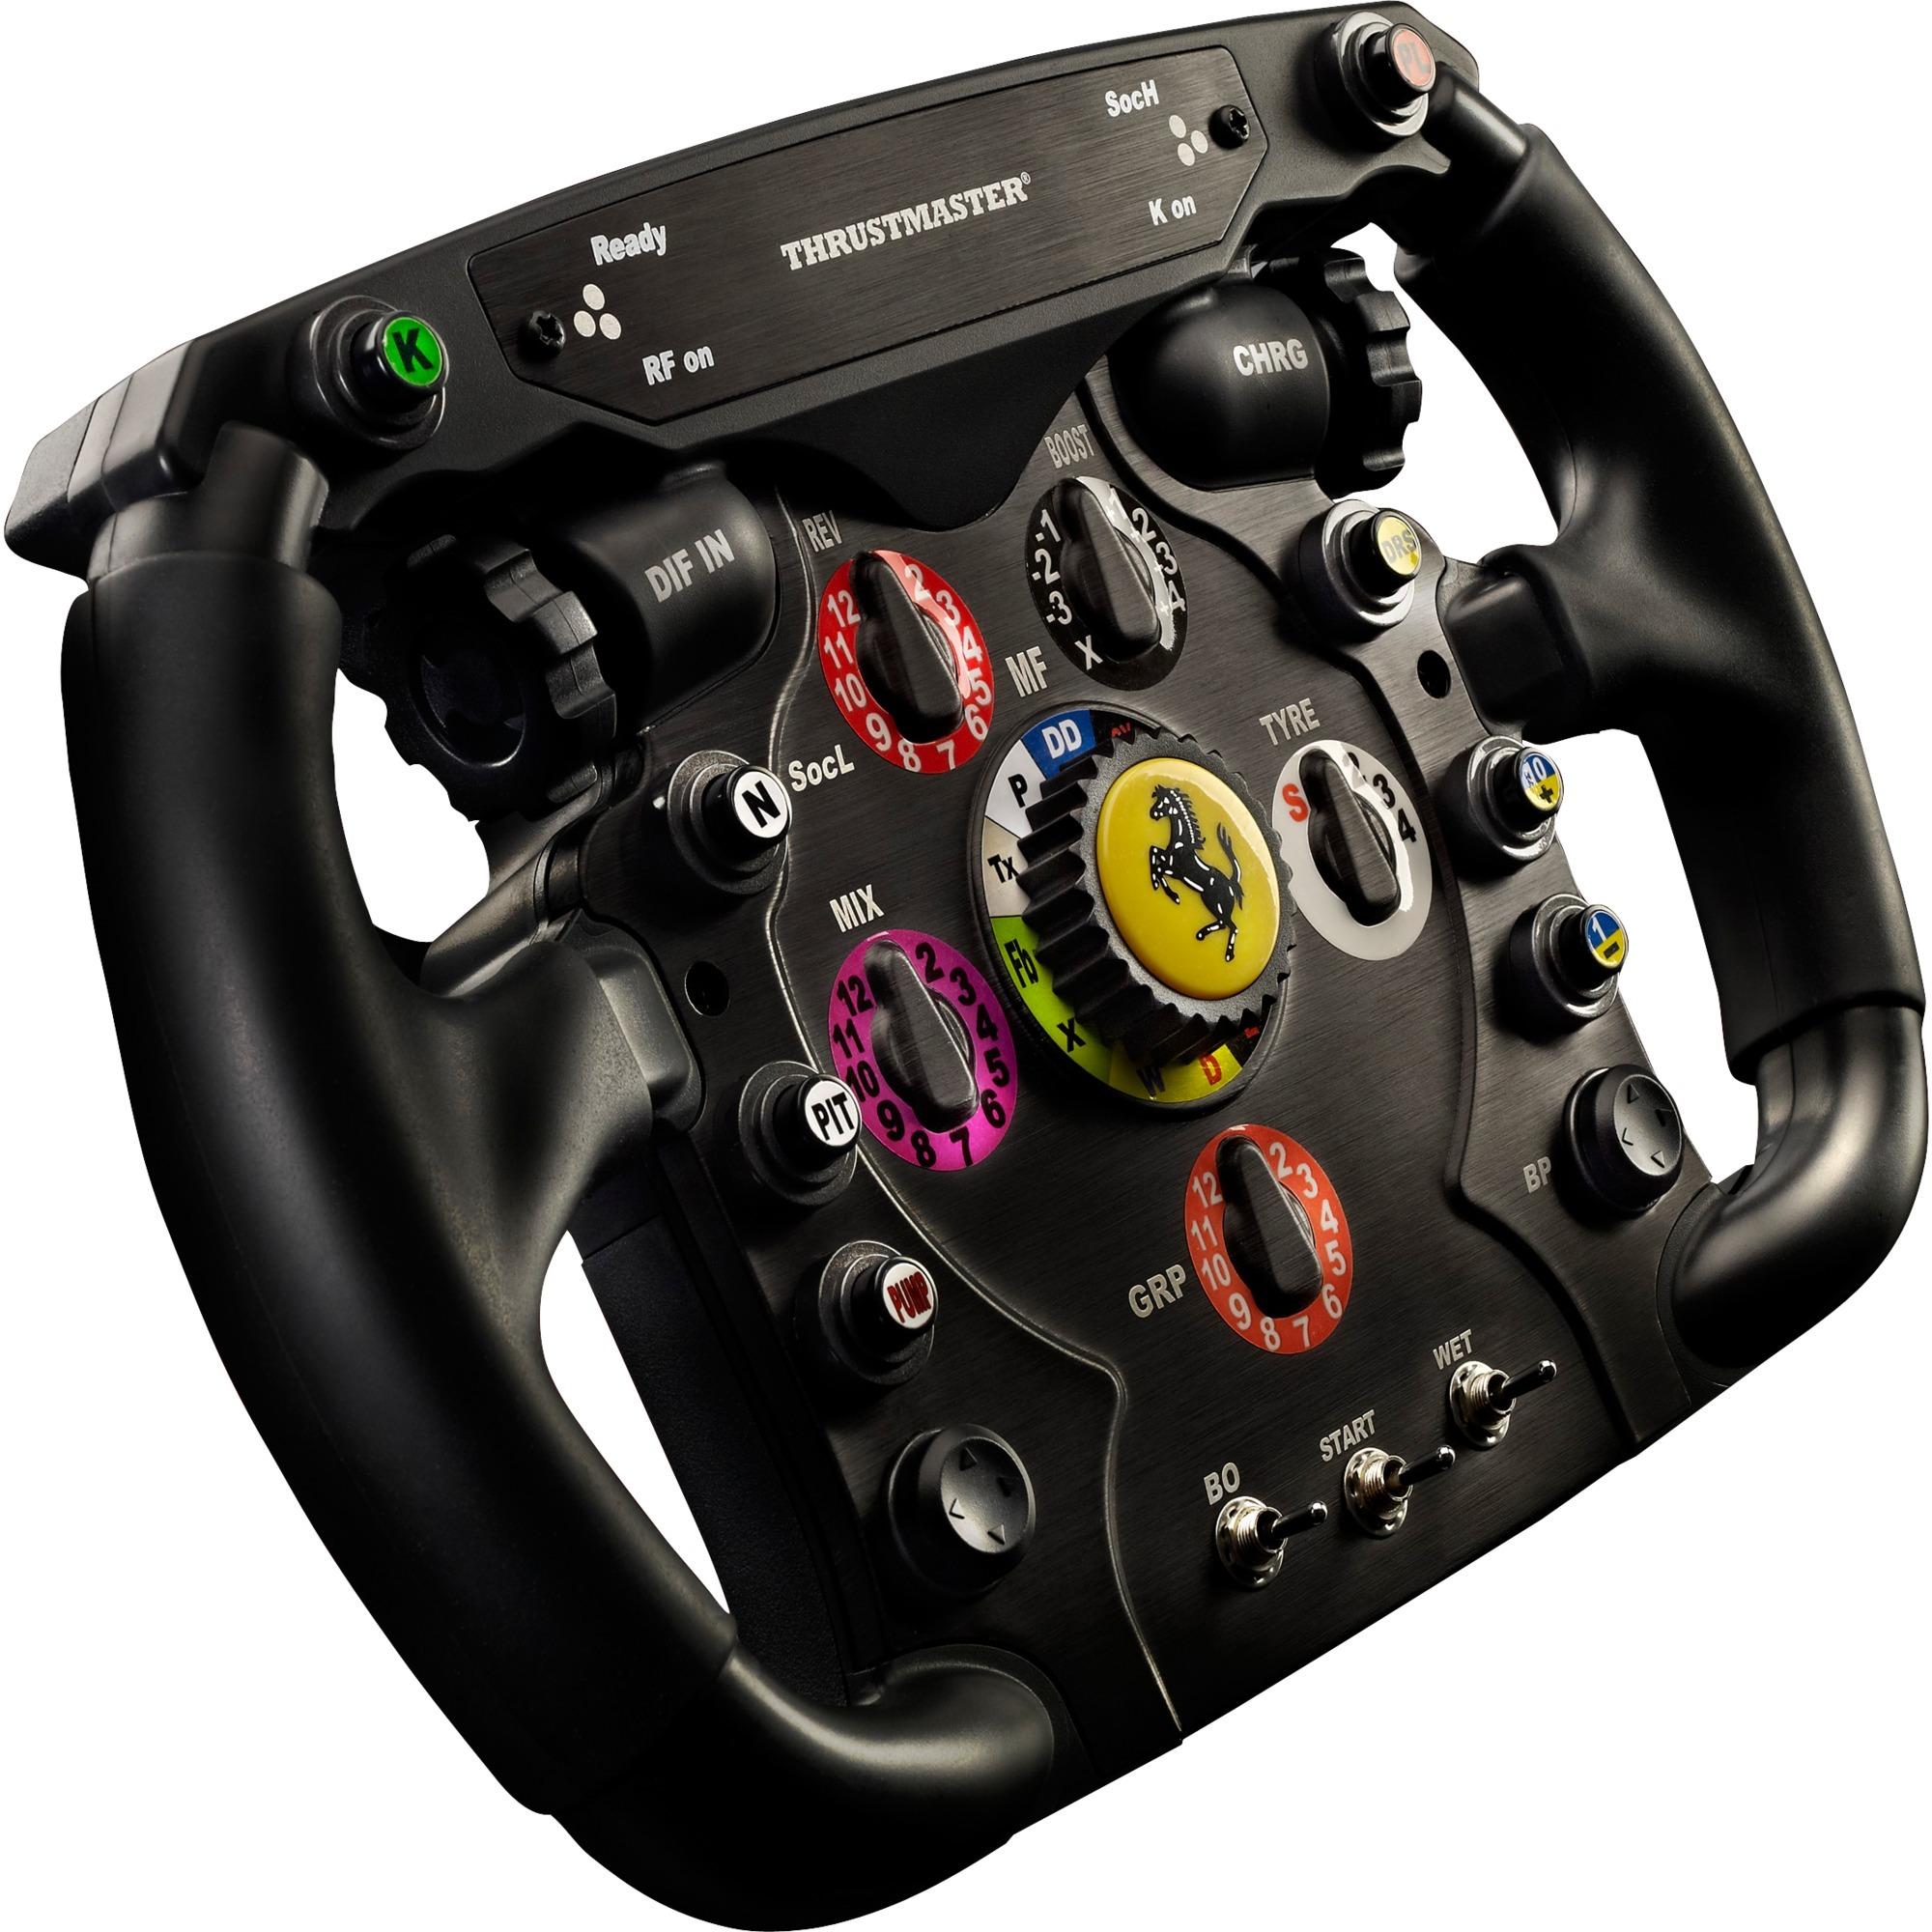 Ferrari F1 Volante PC,Playstation 3 Analógico RF Negro, Volante de recambio